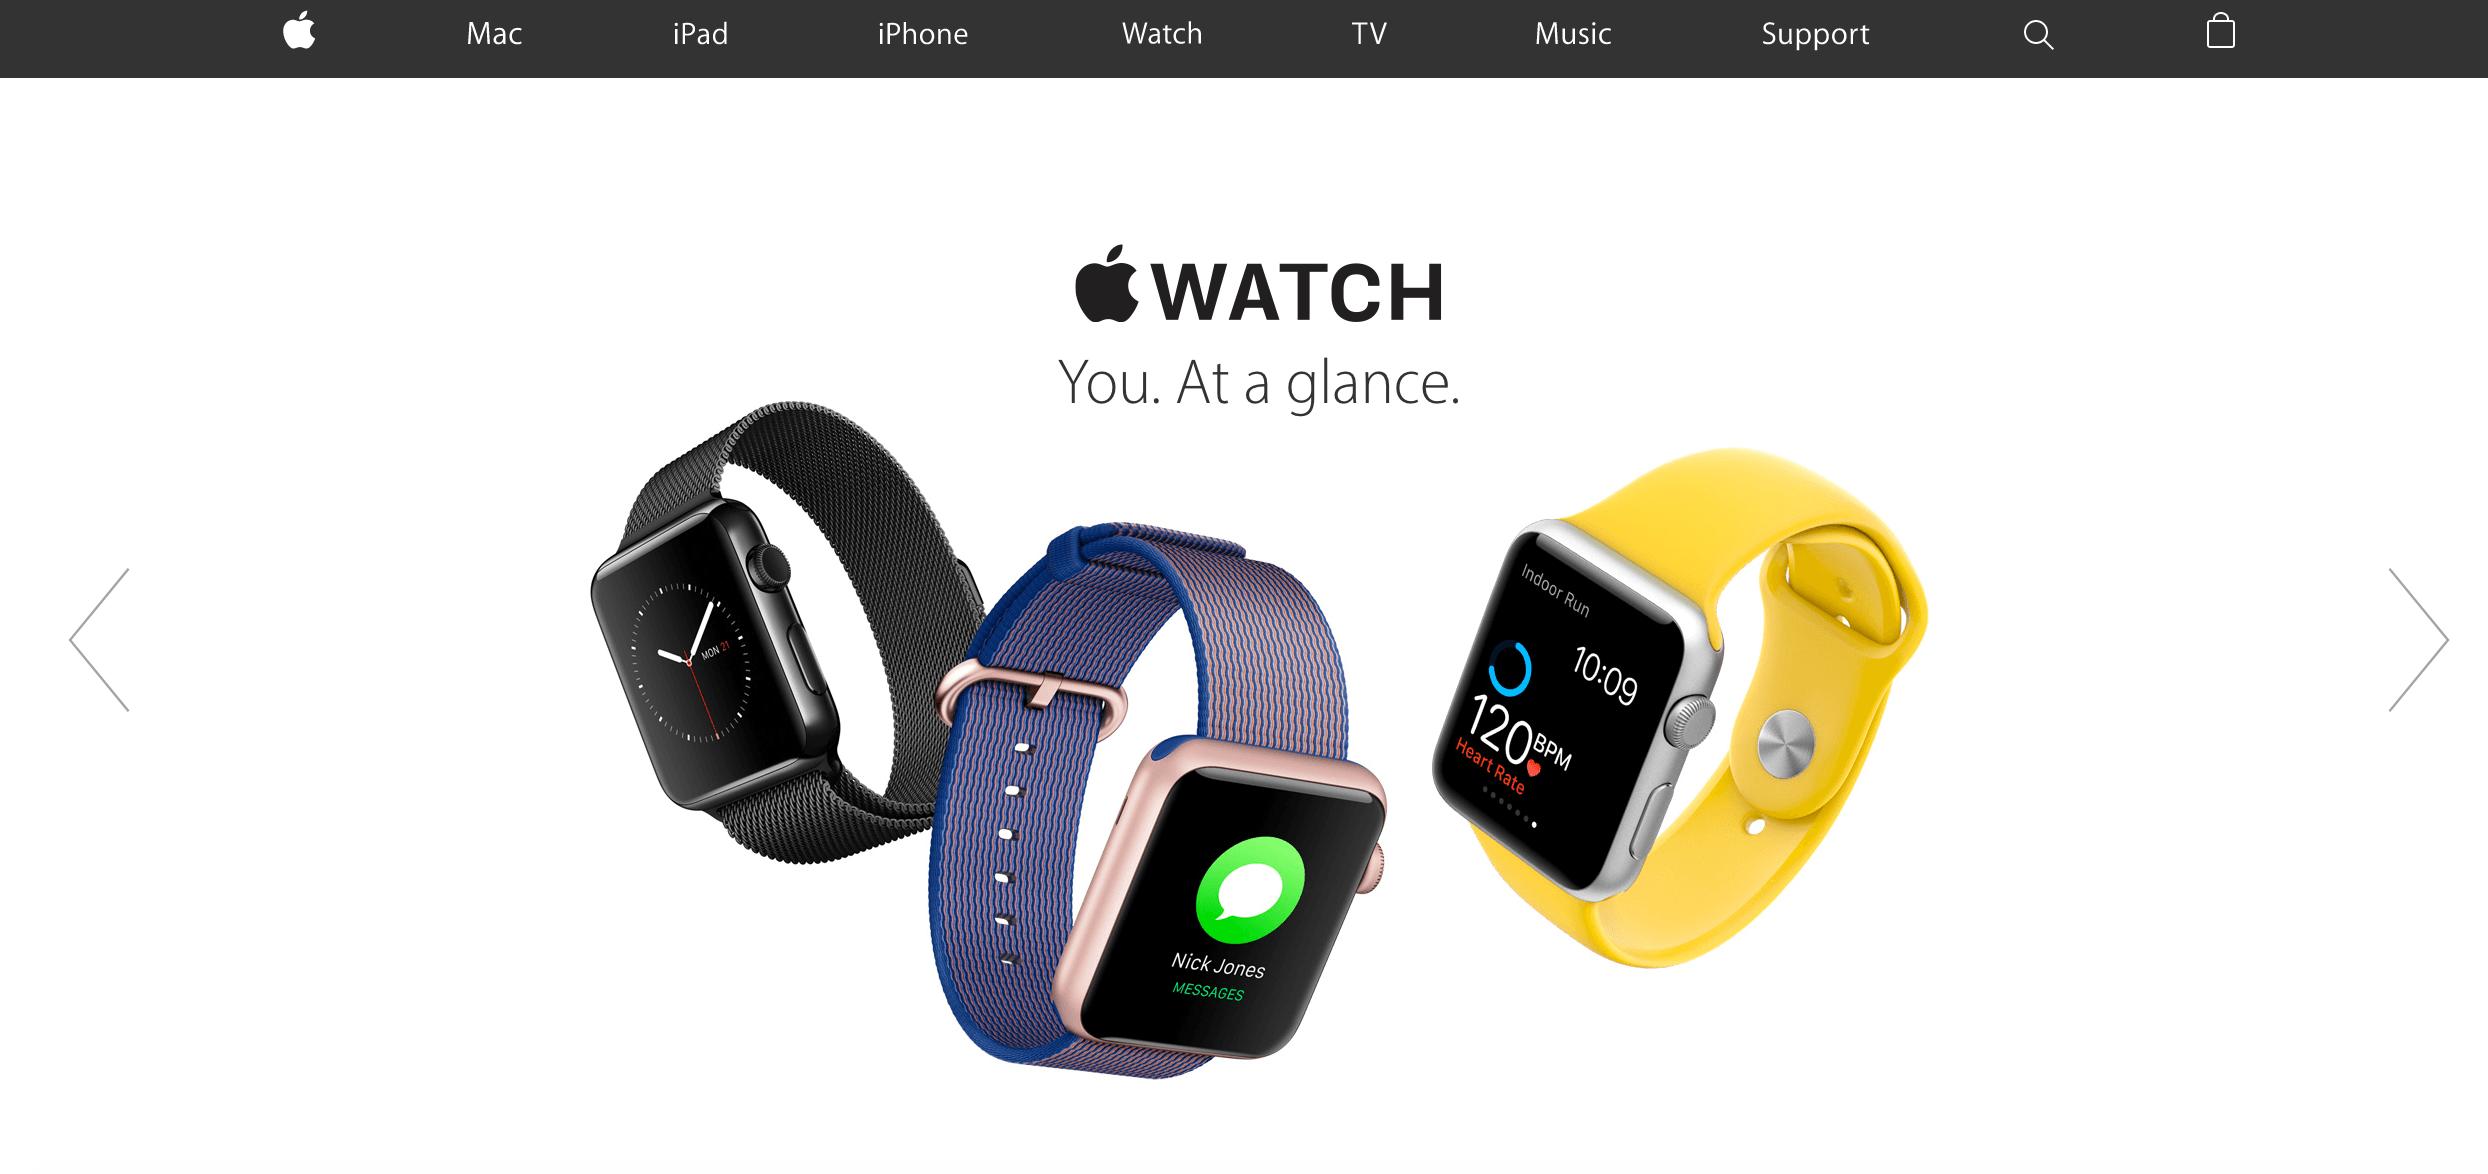 new apple website